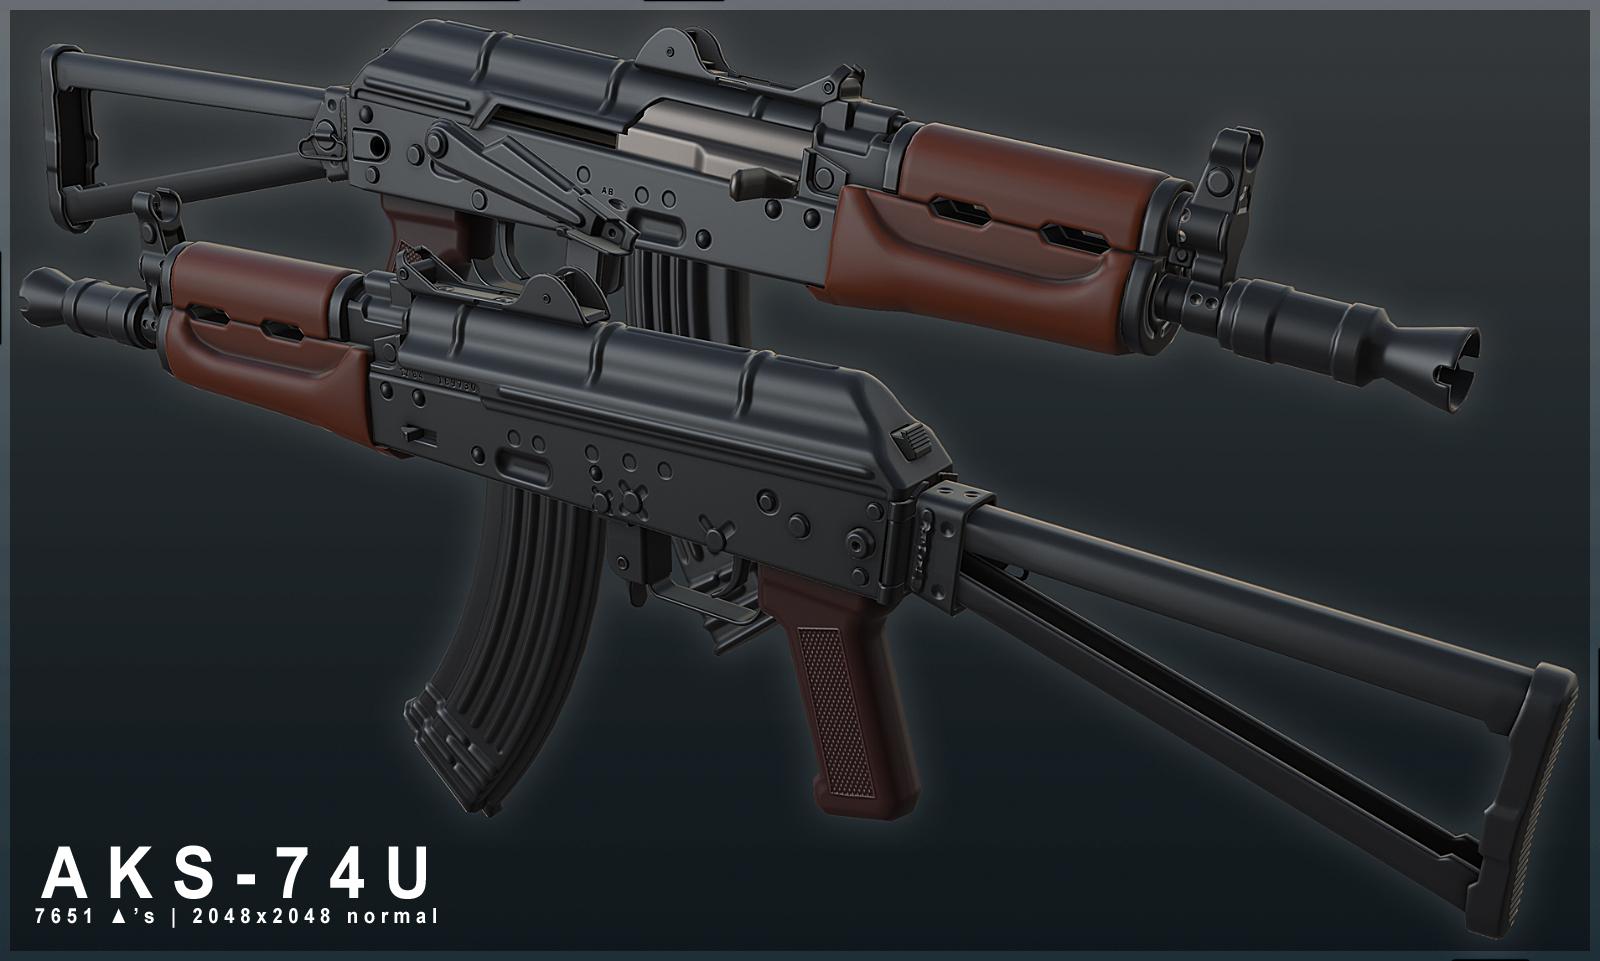 AKS-74U finished image - L.U.R.K. mod for S.T.A.L.K.E.R